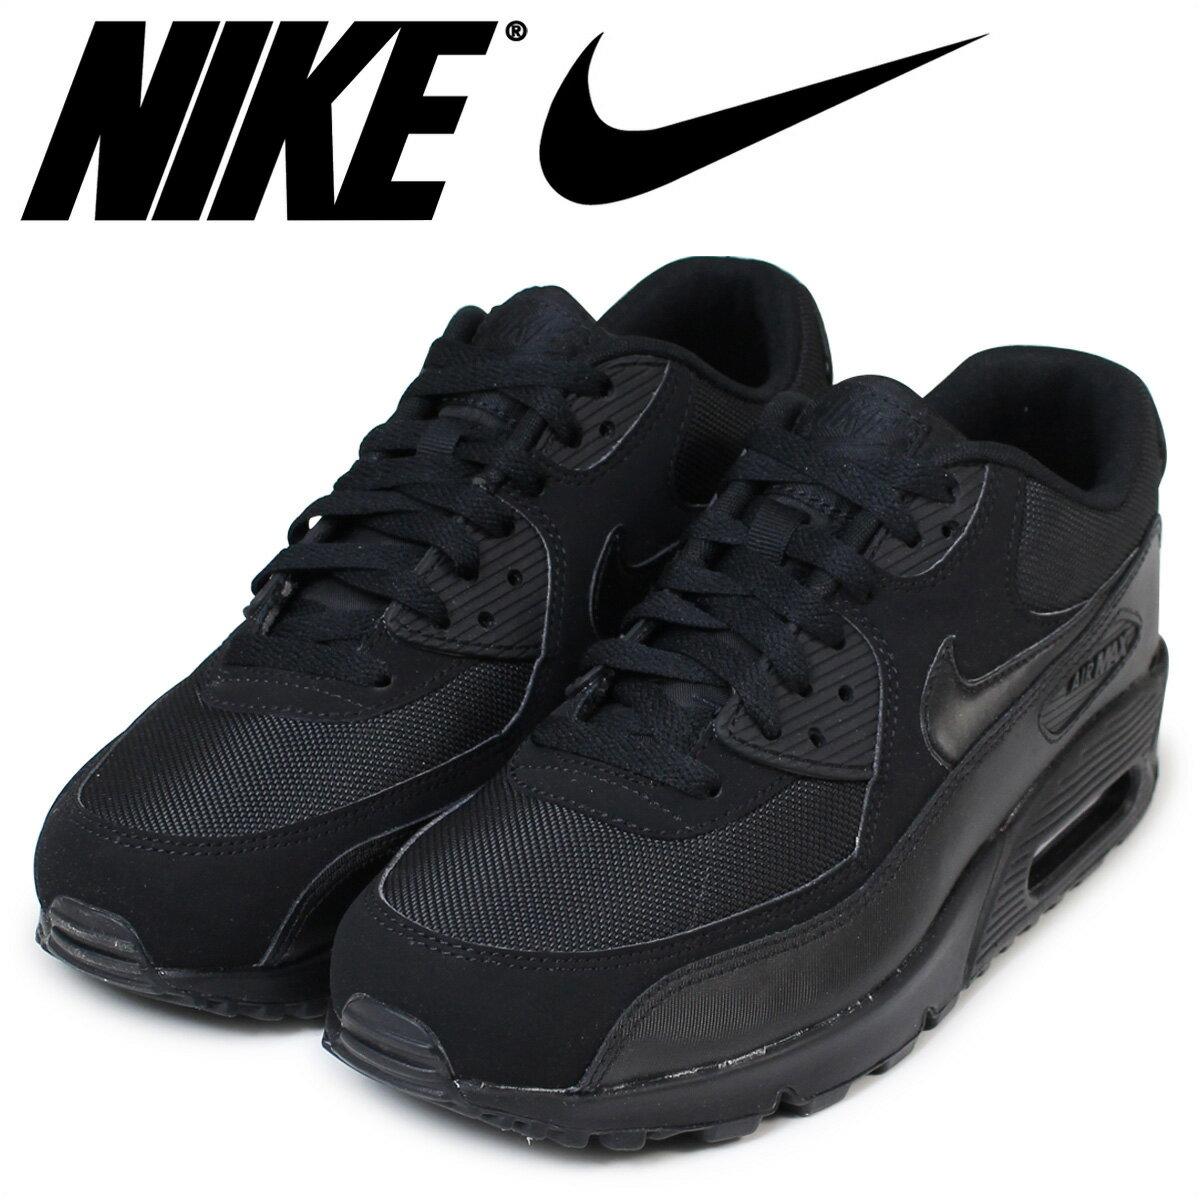 NIKE ナイキ エアマックス90 エッセンシャル スニーカー AIR MAX 90 ESSENTIAL 537384-090 メンズ 靴 ブラック [予約商品 4/23頃入荷予定 追加入荷]